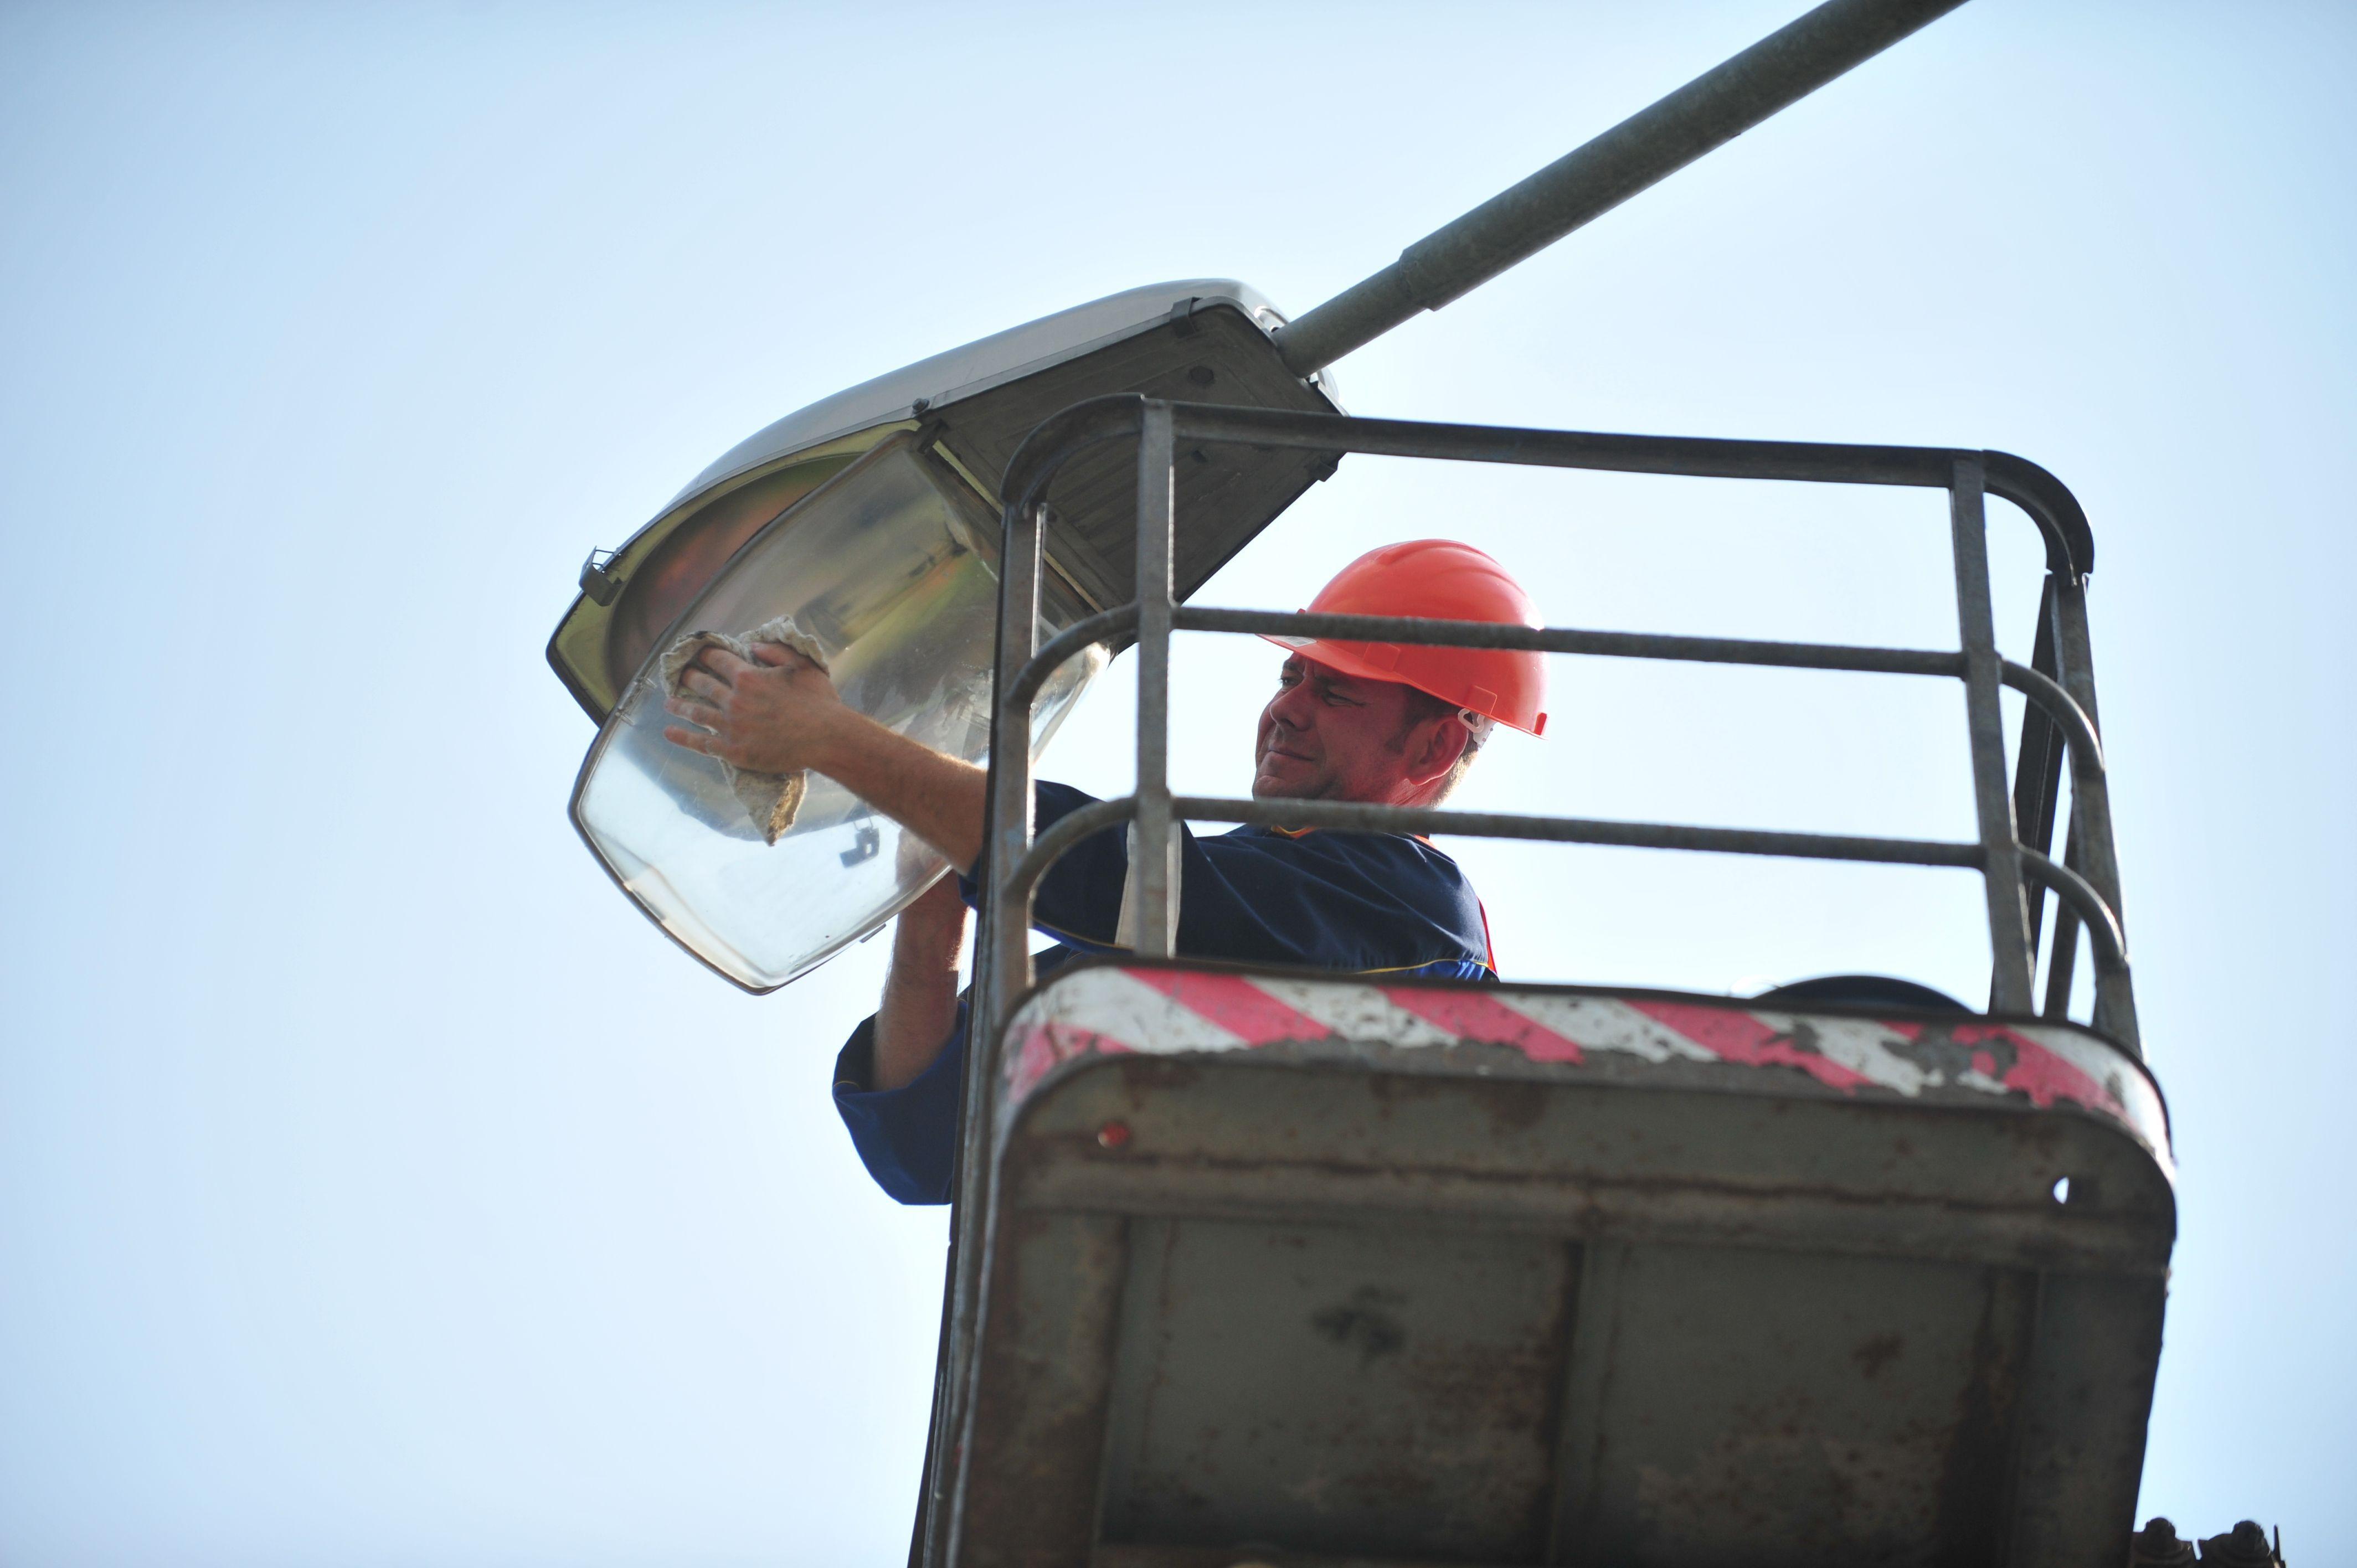 На объекте работает подрядчик. Фото: Александр Казаков